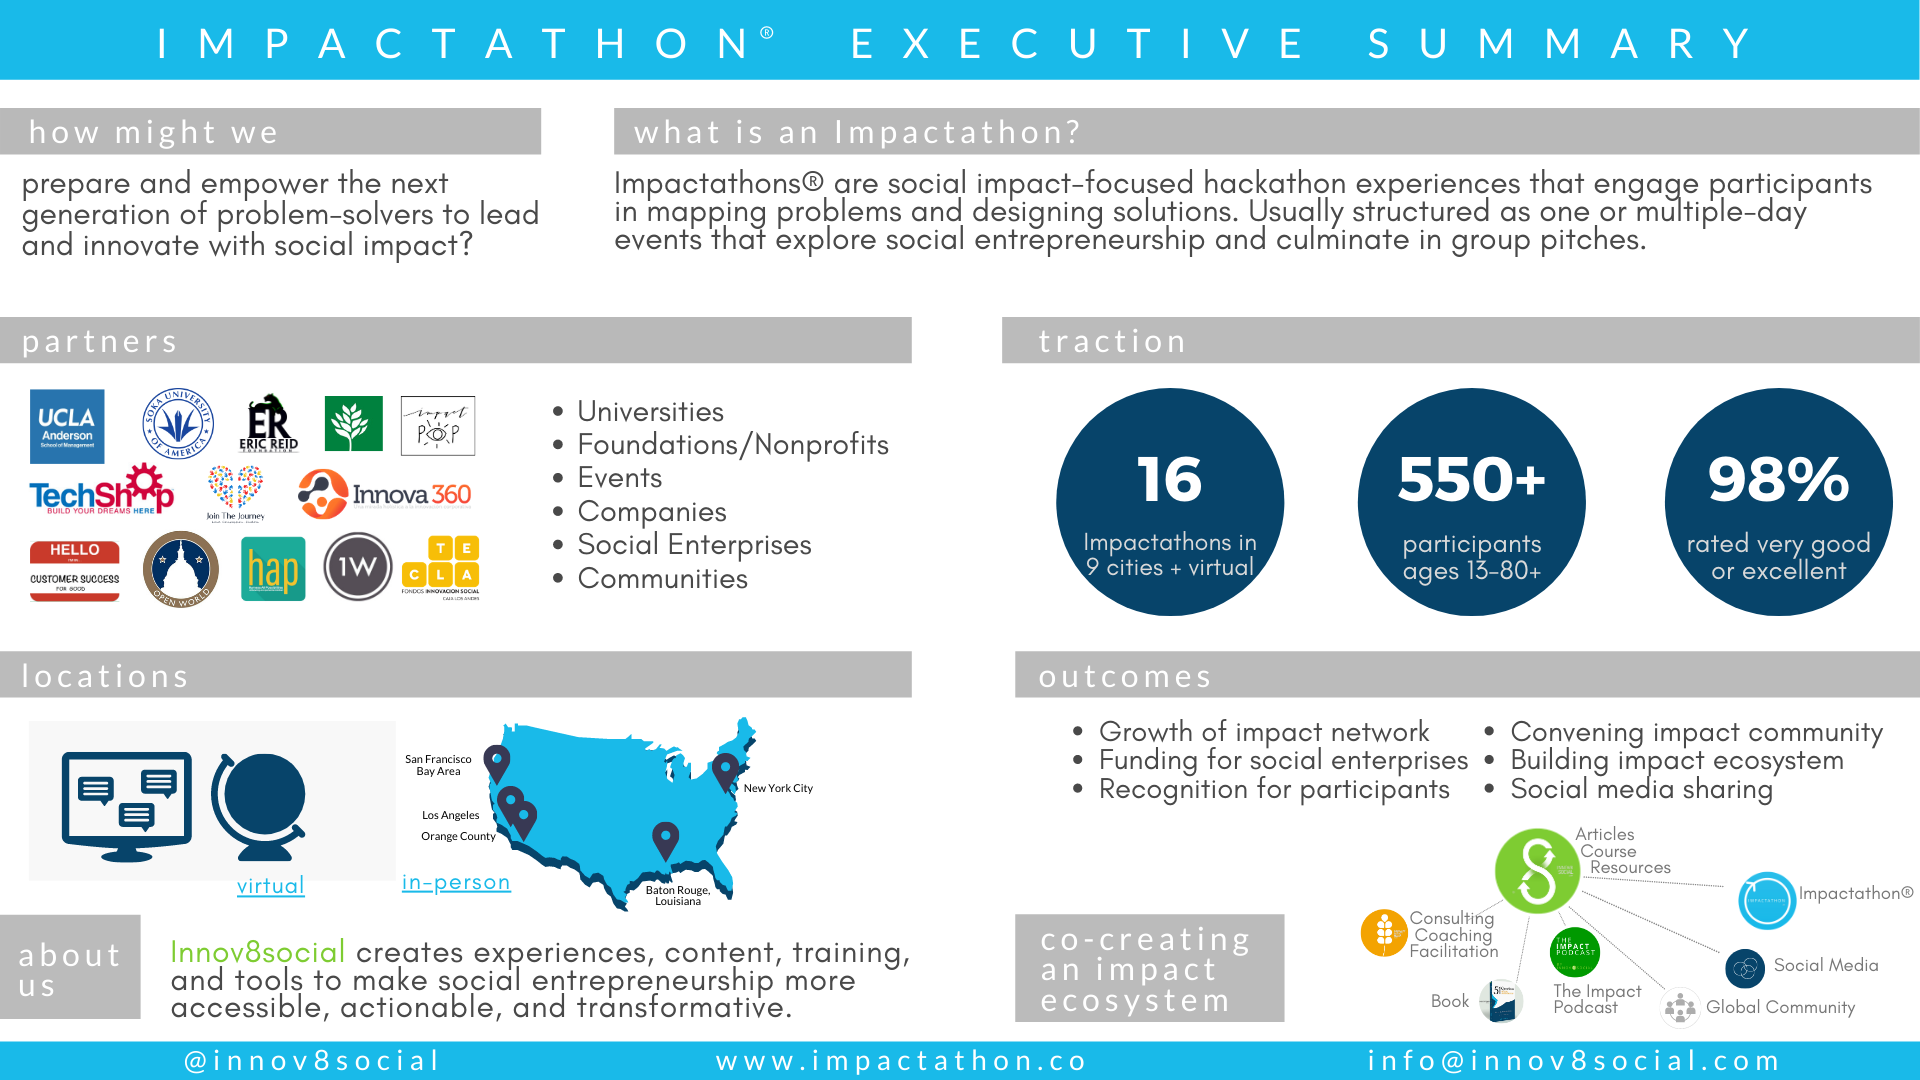 Impactathon Executive Summary